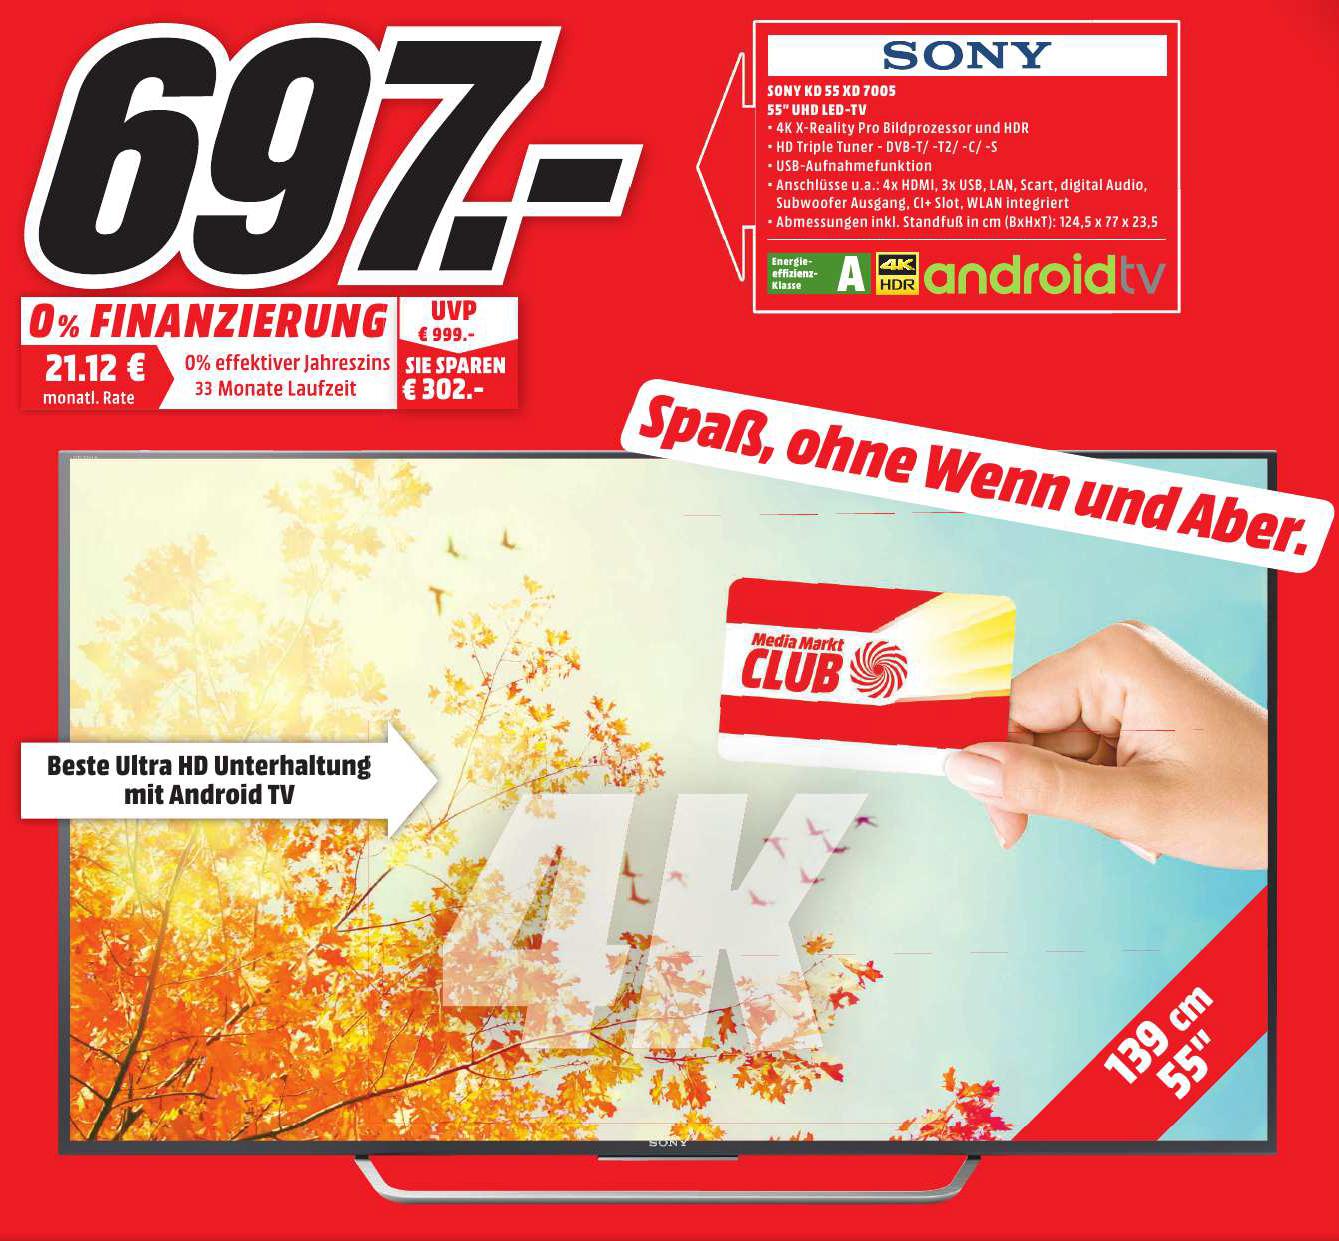 "[lokal] Media Markt Schwentinental - Sony KD-55XD7005 für 697€ - 55"" UHD TV"